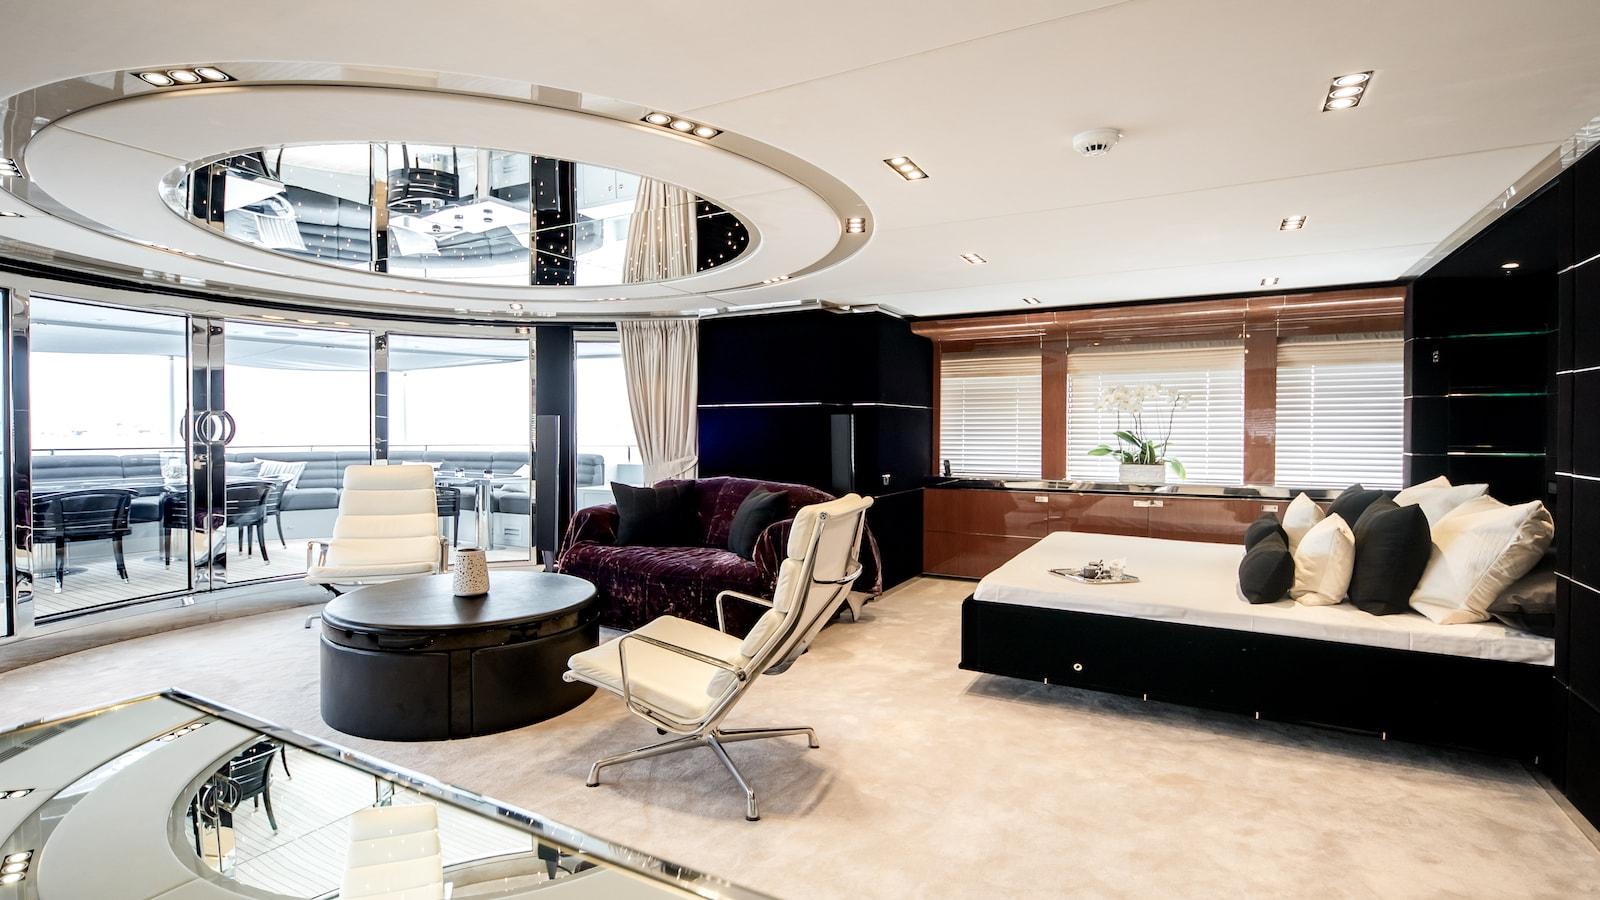 Converted Upper Salon